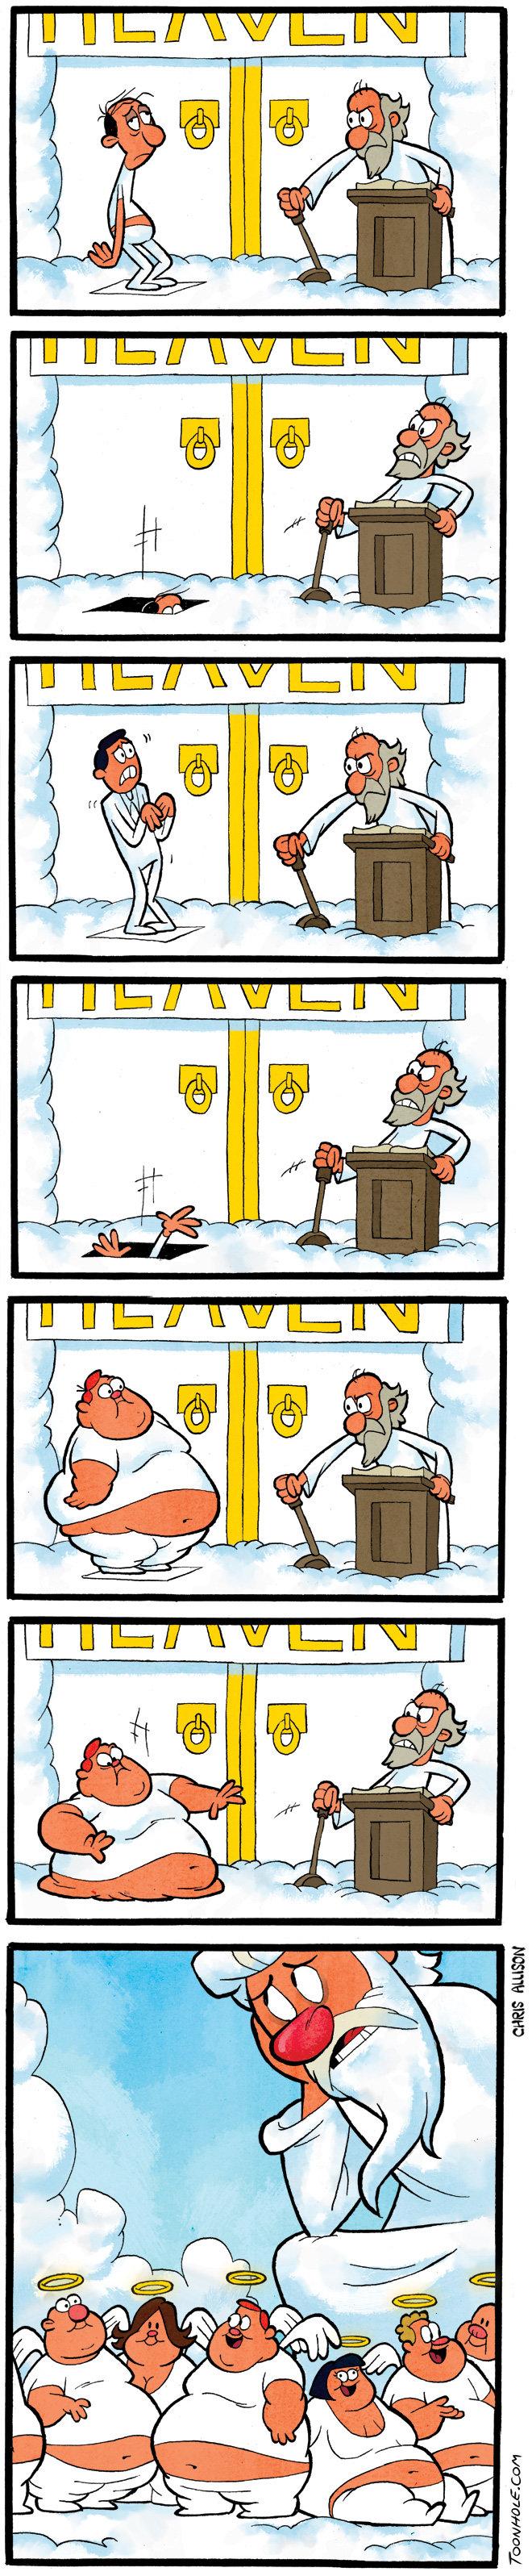 Heaven.. Hog Heaven. more comics mon-wed-fri at www.Toonhole.com.. I bet that really rustles gods jimmies since gluttony is a sin. toonhole toon cartoon comic webcomic gag heaven Fatty hog heaven getting into hea